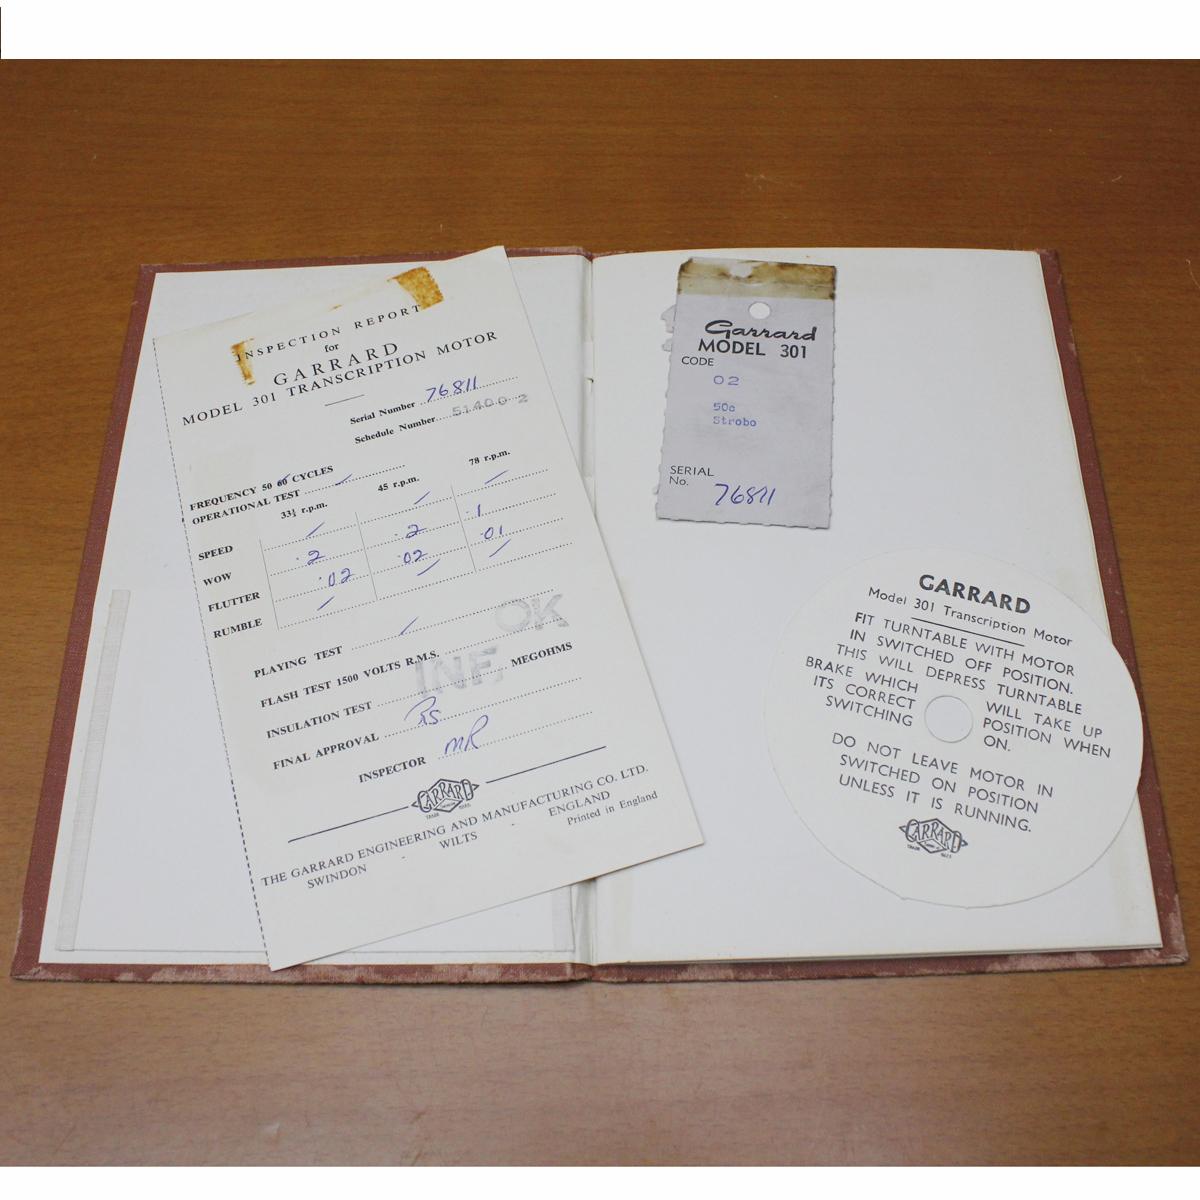 GARRARD301 manual[SN:768○○番台(星7)]ガラード英文取扱説明書 マニュアル おまけ日本語解説コピー付き_画像4